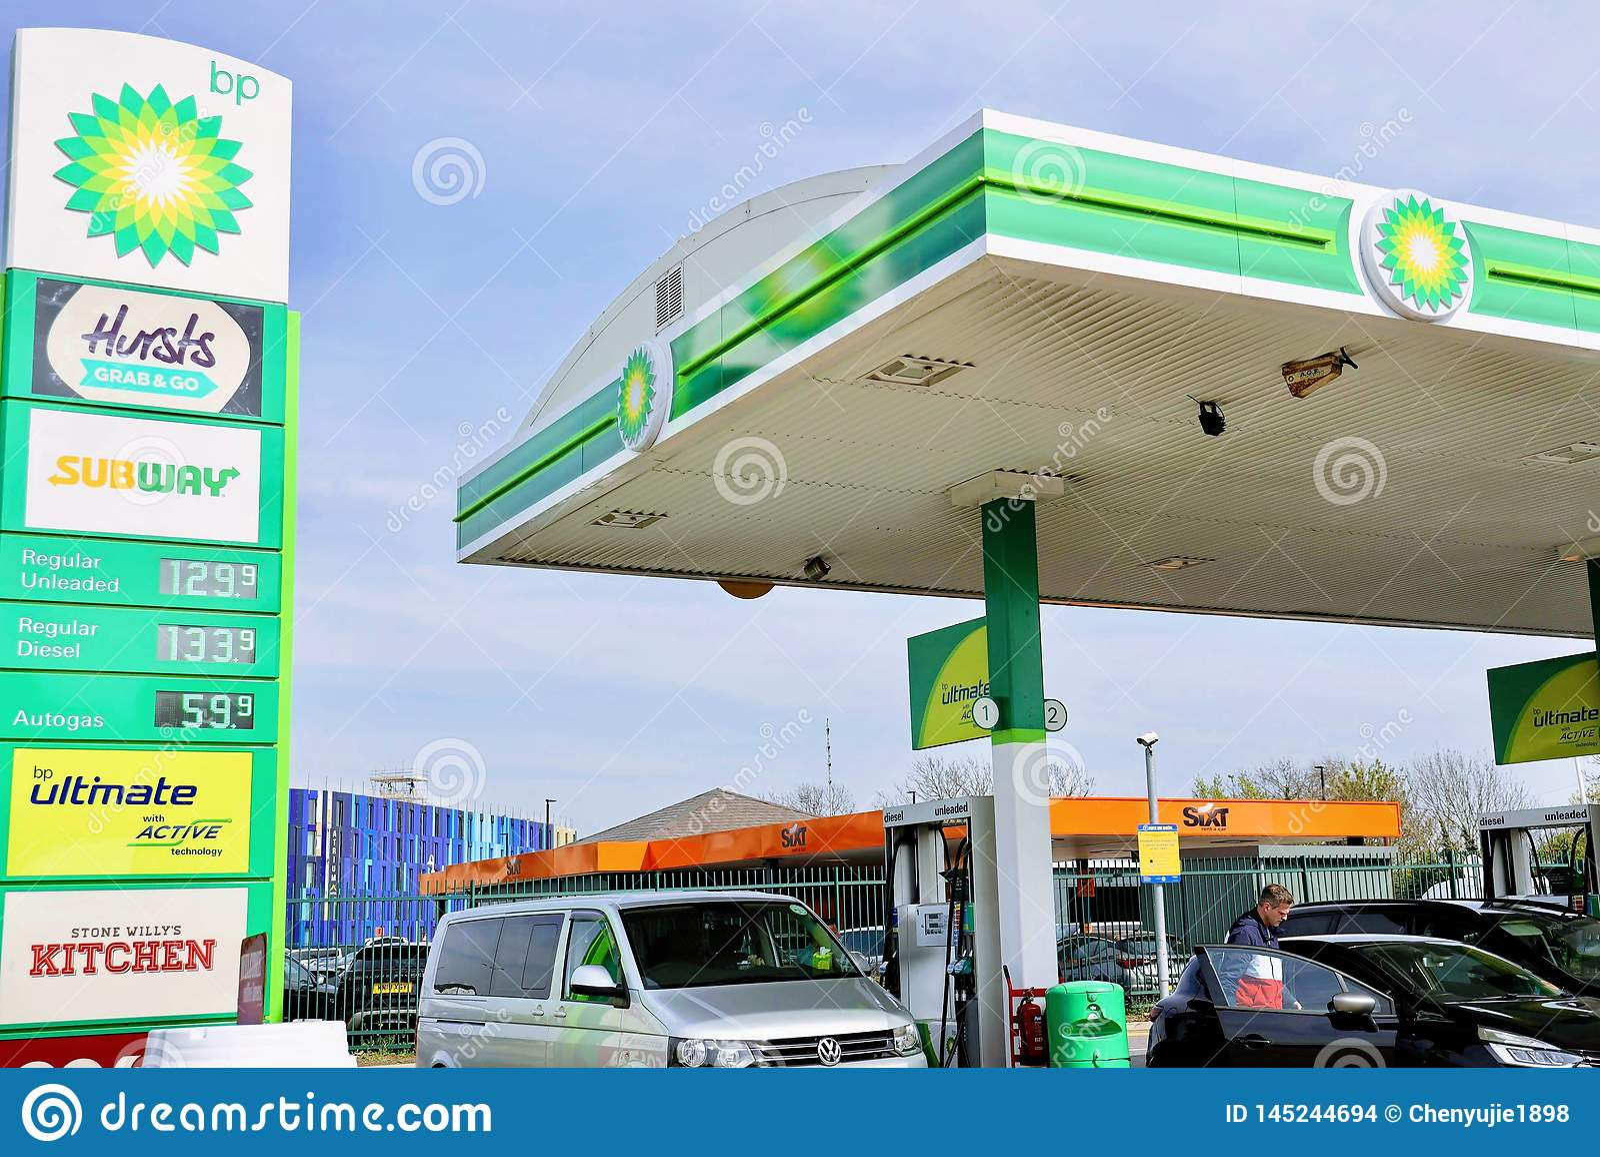 BP petrol station editorial stock image  Image of petrol - 145244694